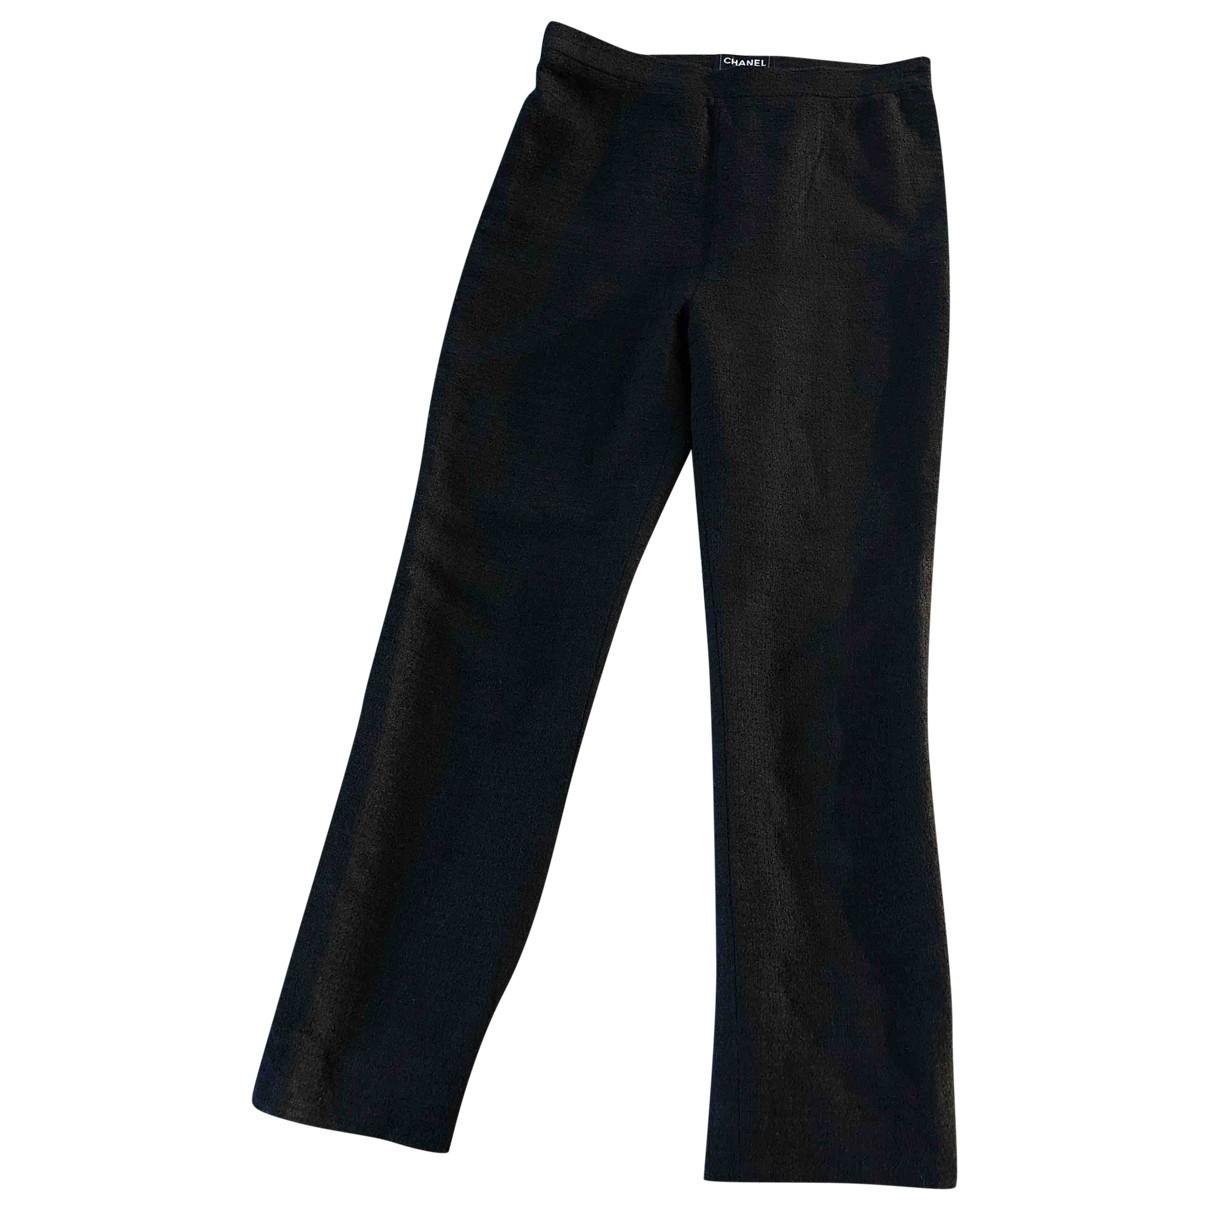 Chanel \N Black Linen Trousers for Women 36 FR